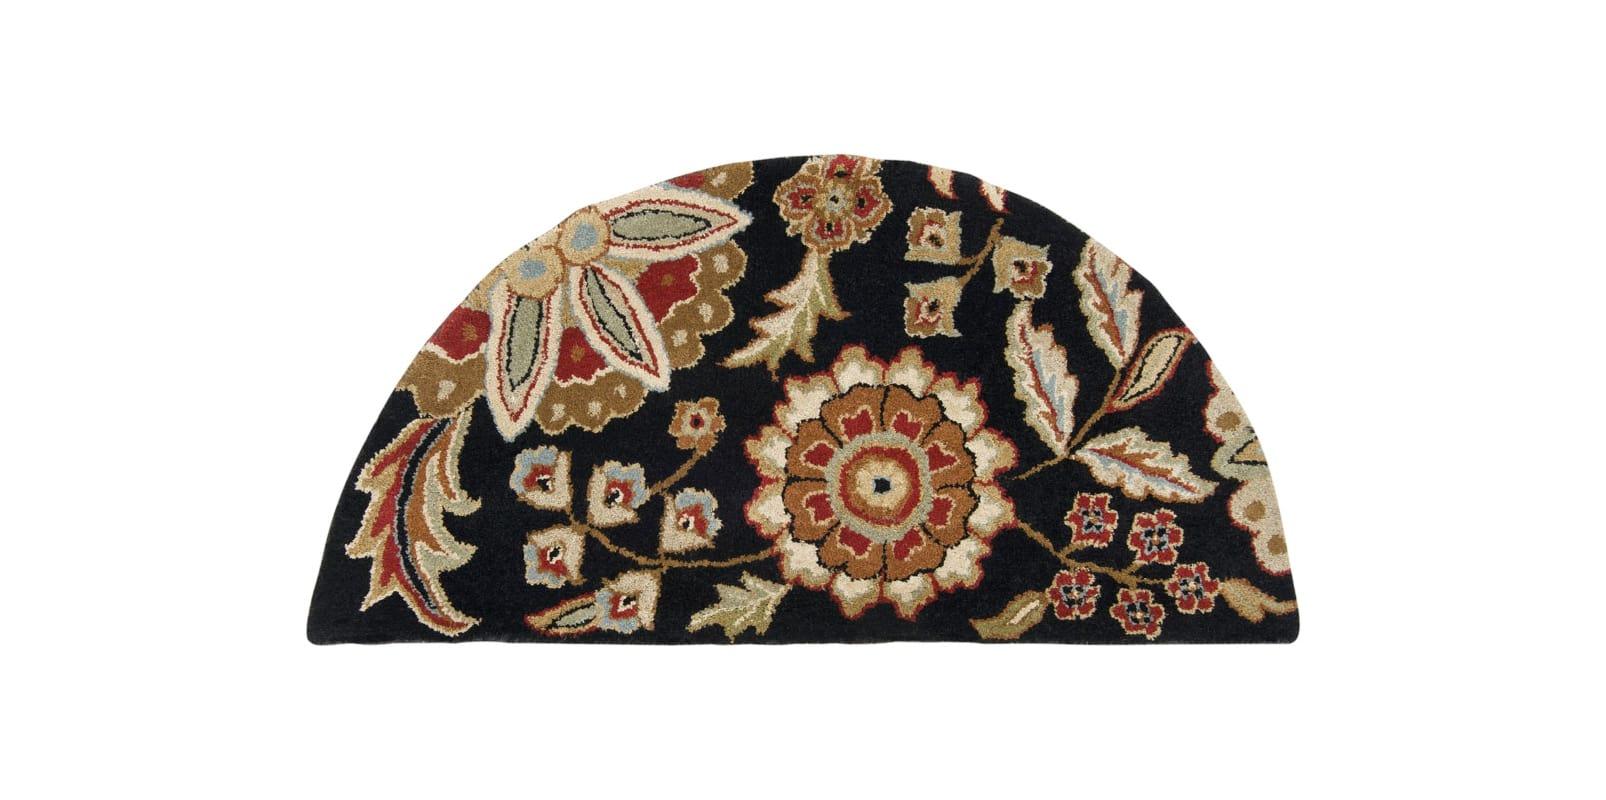 Surya ATH-5017 Athena Hand Tufted Wool Rug Black 2 x 4 Home Decor Rugs